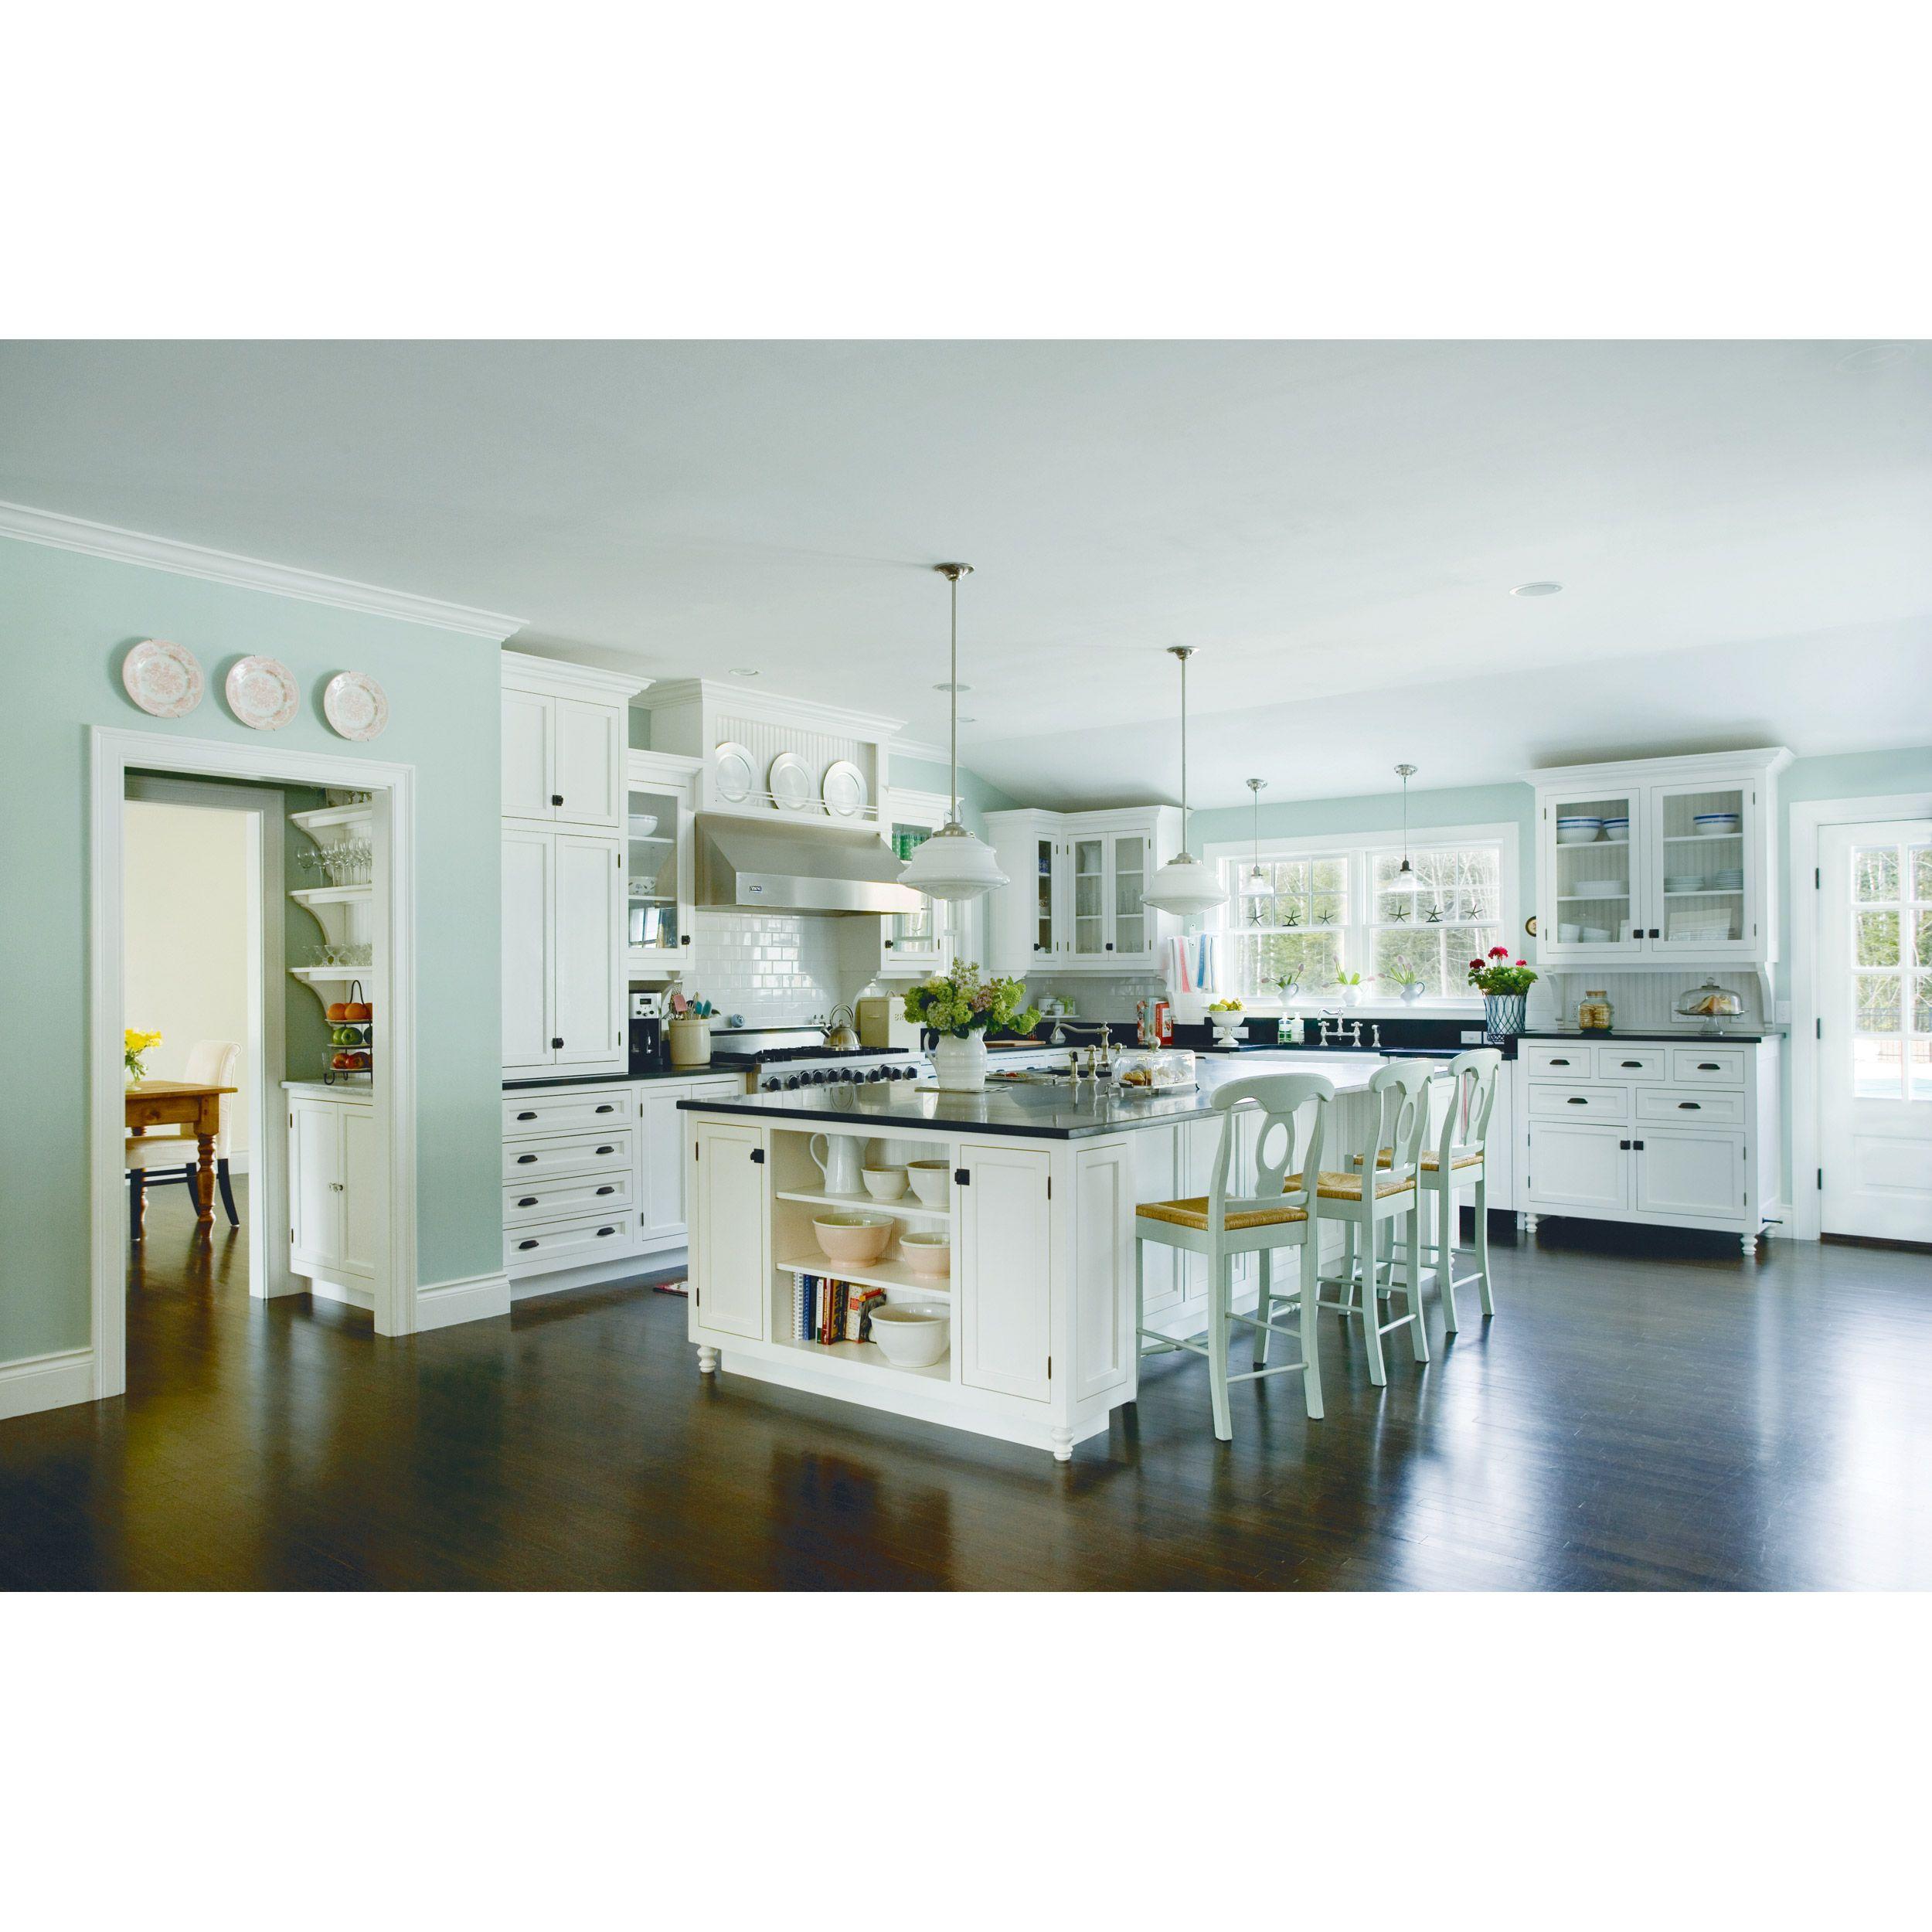 White Kitchen Cabinets For Sale: Hudson Valley 3416-PN Petersburg Polished Nickel Pendant